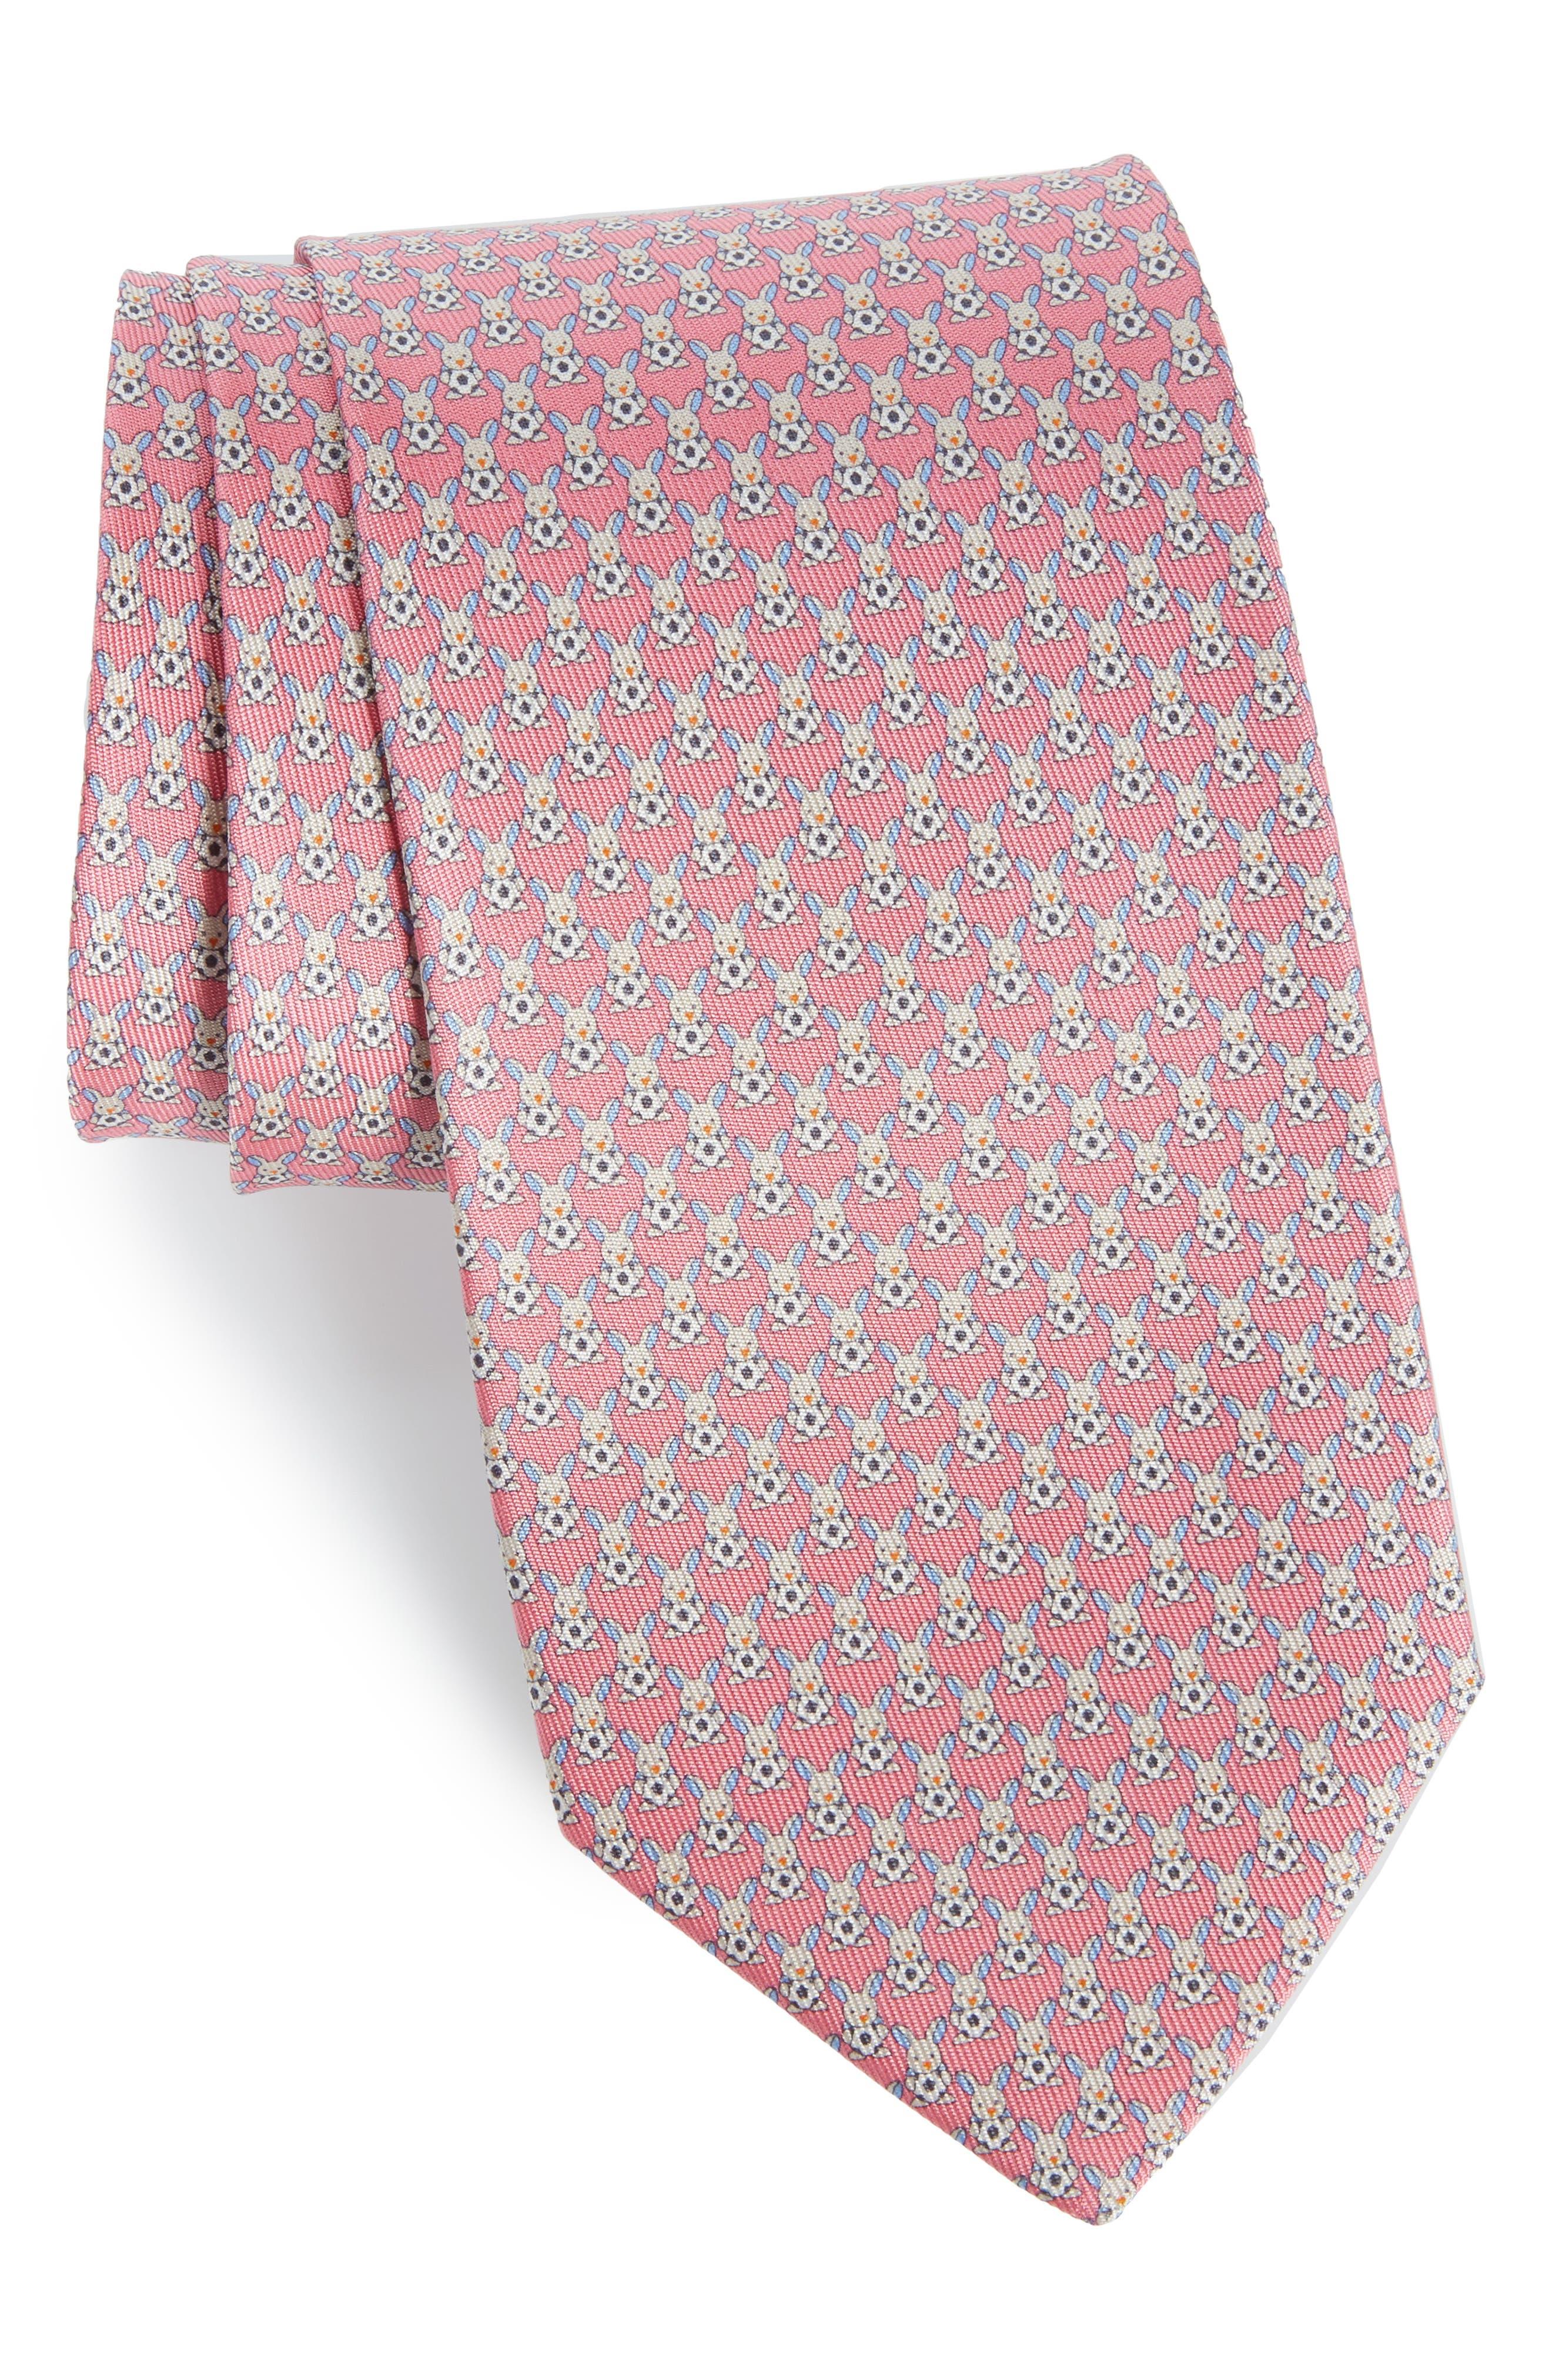 Errico Bunny Print Silk Tie,                             Main thumbnail 1, color,                             Pink